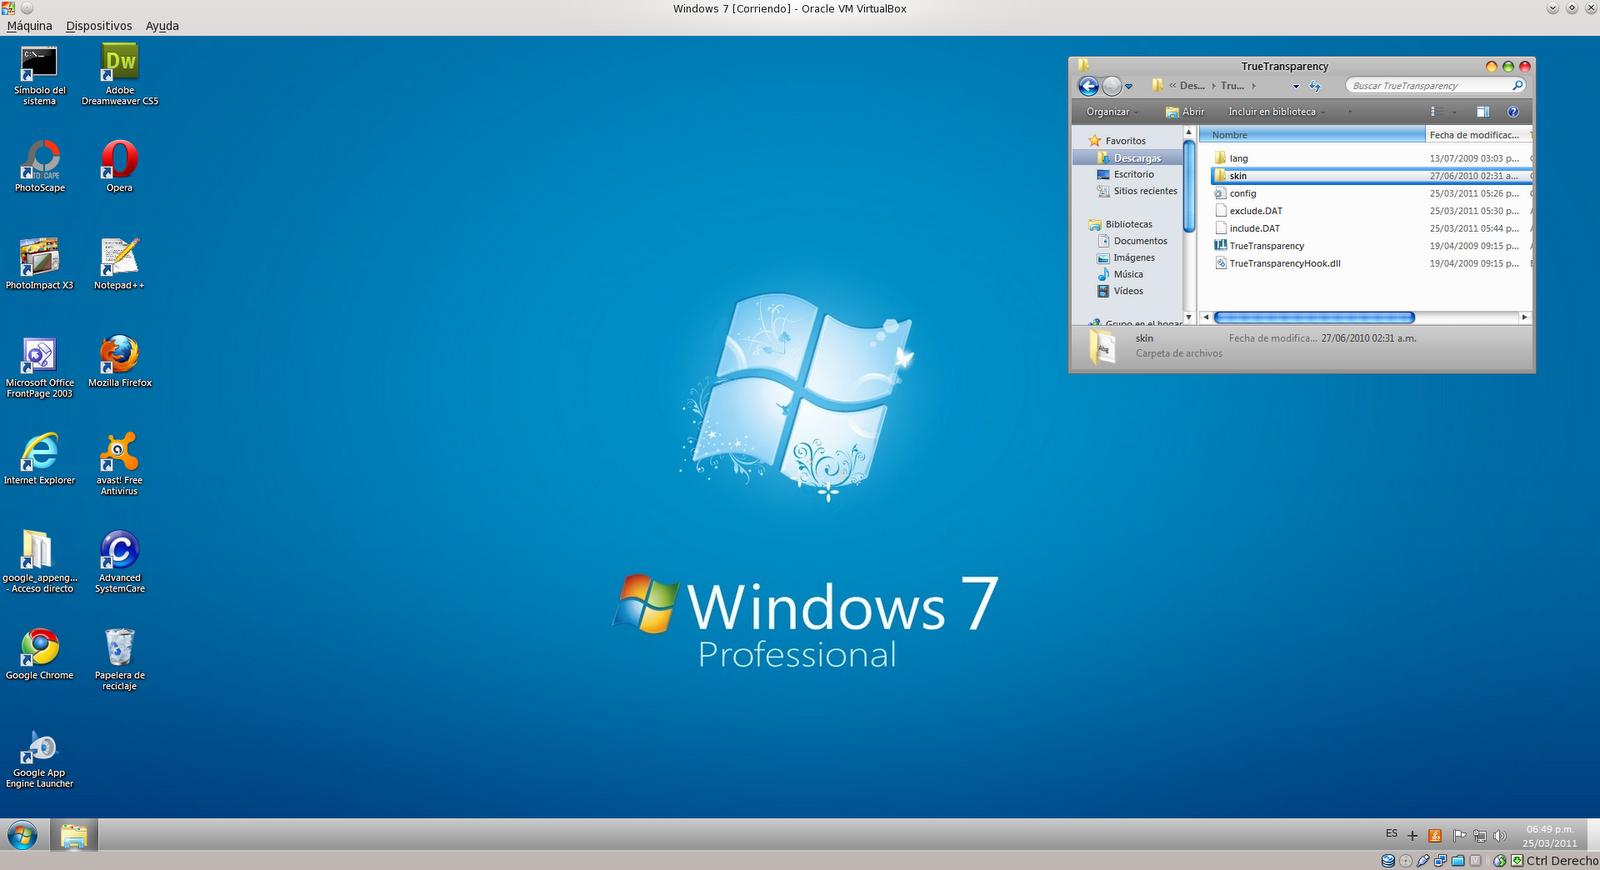 49+] Windows 7 Home Basic Wallpaper on WallpaperSafari